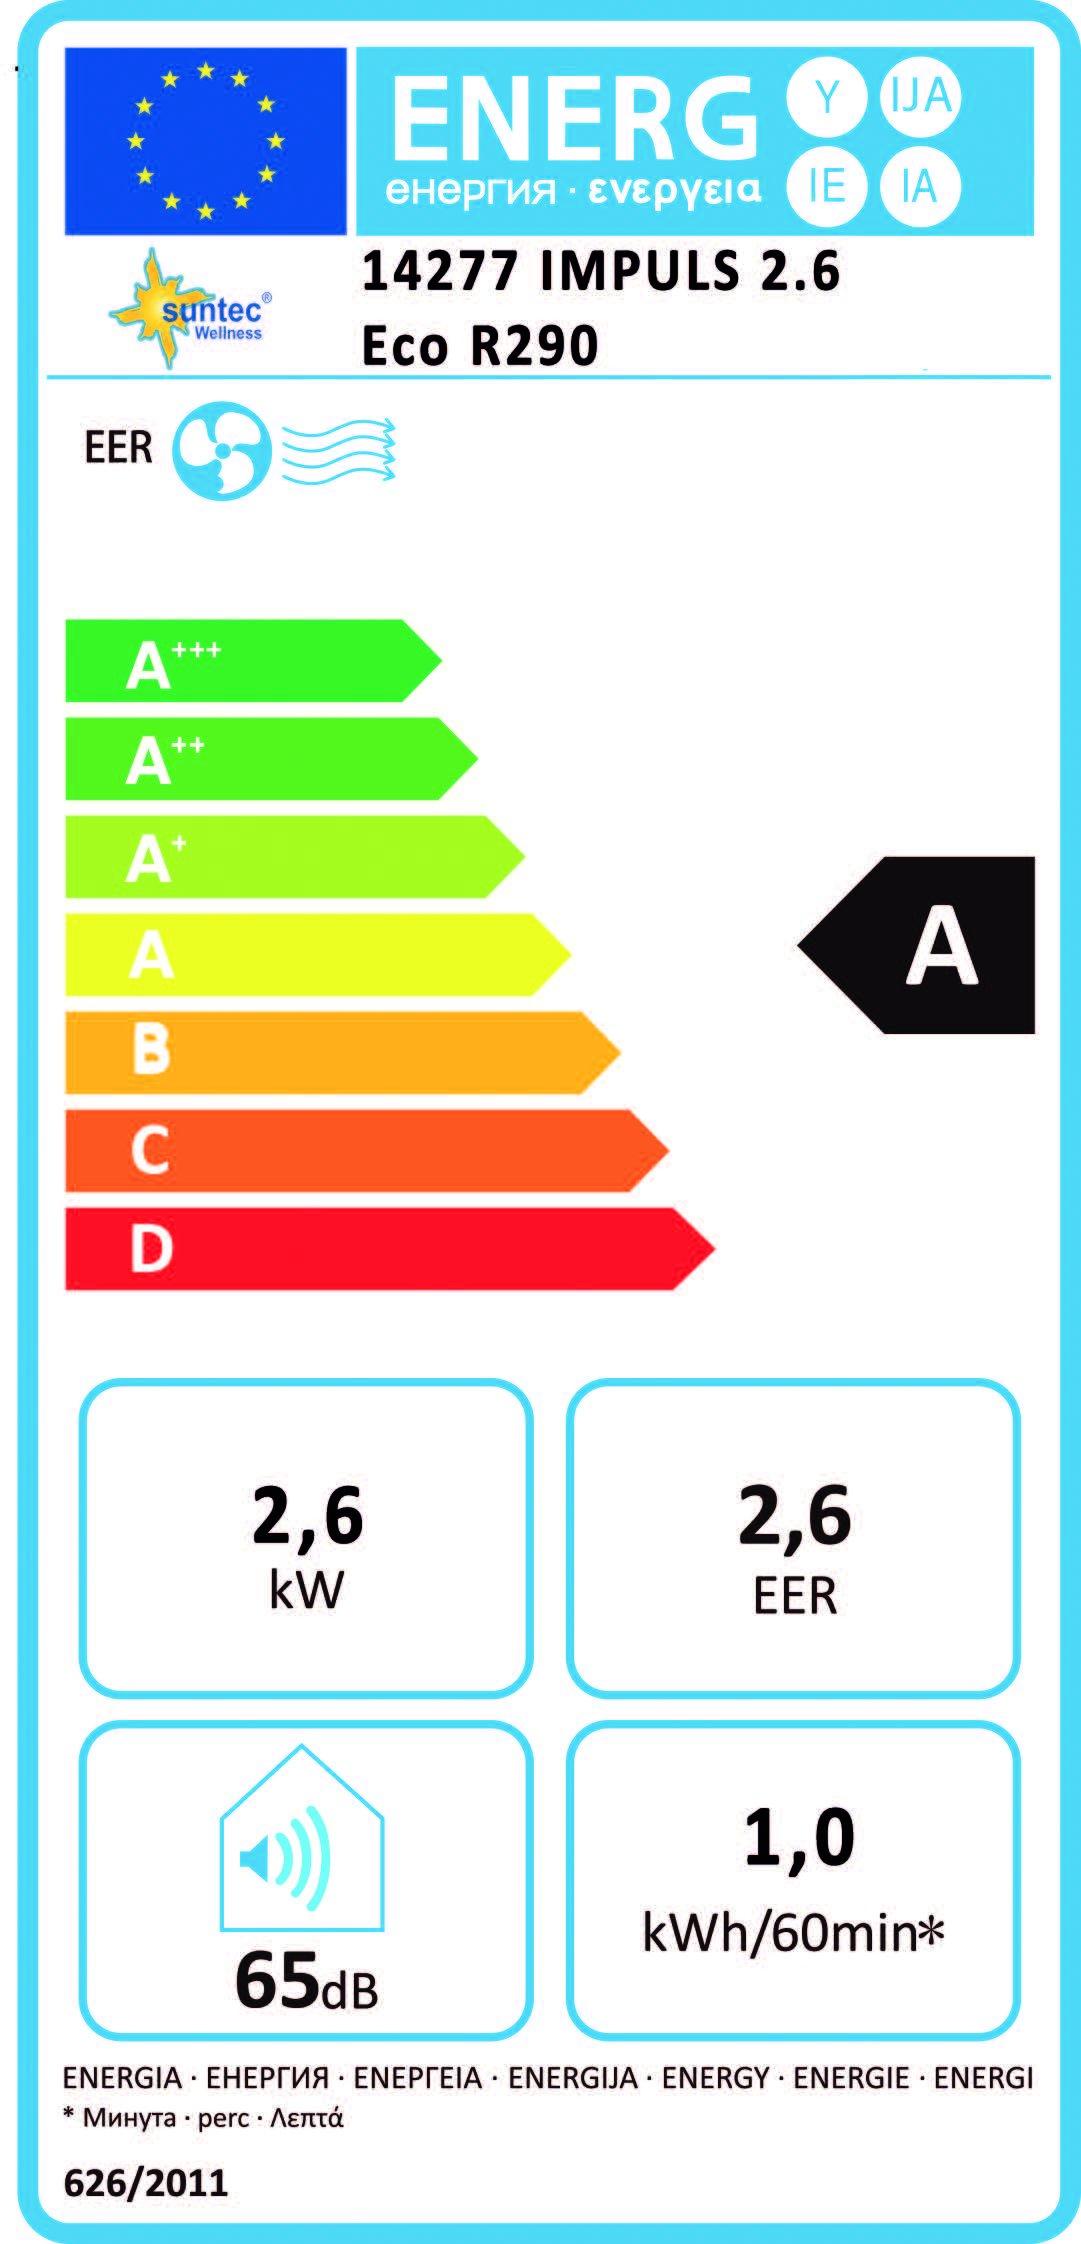 Suntec Wellness 15427 IMPULS 3.8 Eco R290 mobiles lokales Klimagerät Schwarz-Weiß